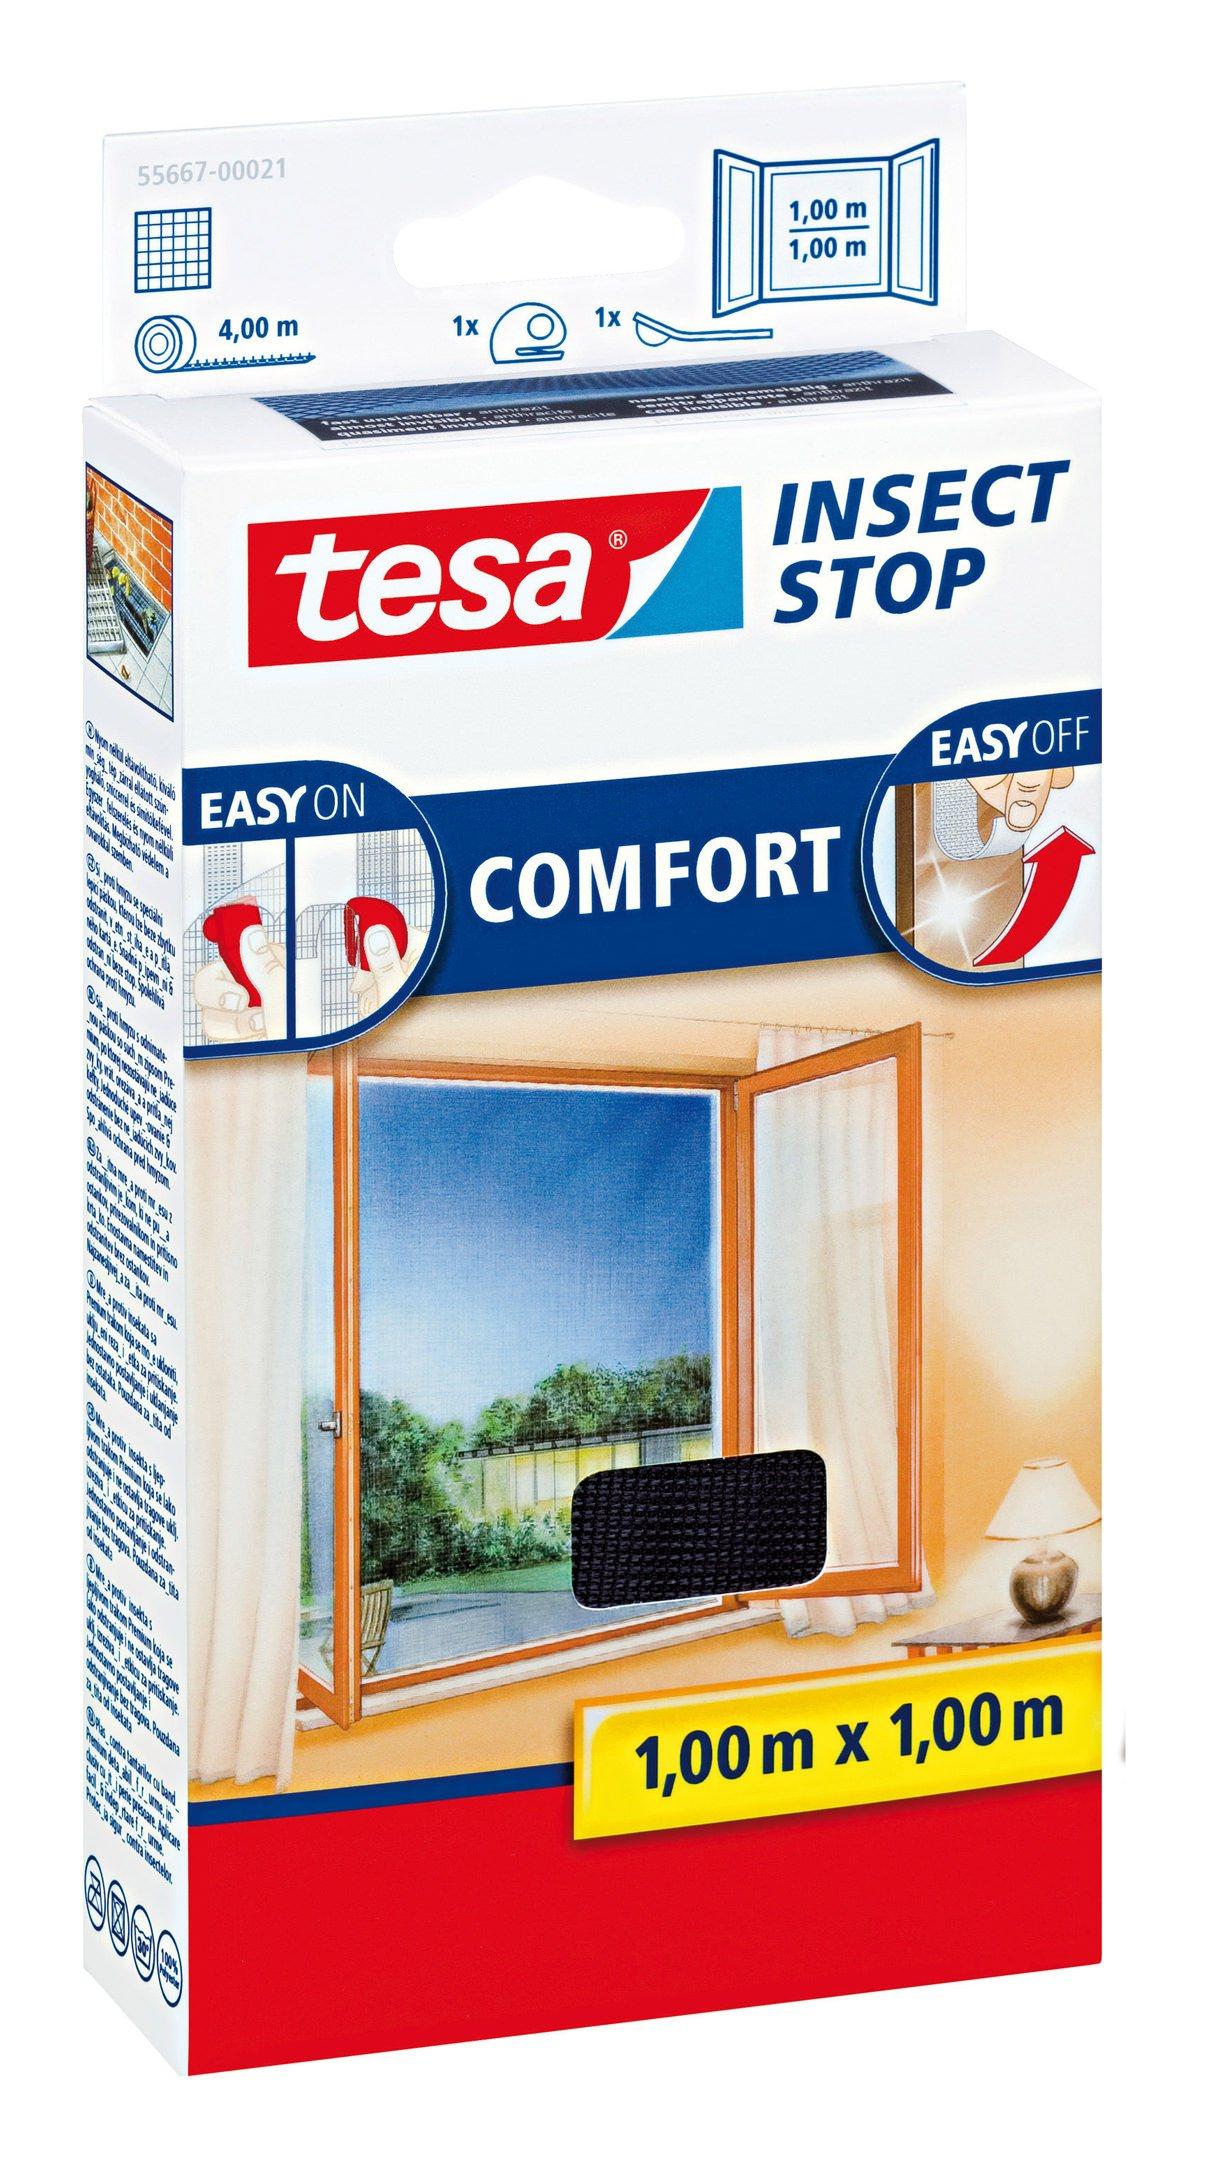 tesa fliegengitter klettband 5 6m ersatzrolle 55387 20 00. Black Bedroom Furniture Sets. Home Design Ideas